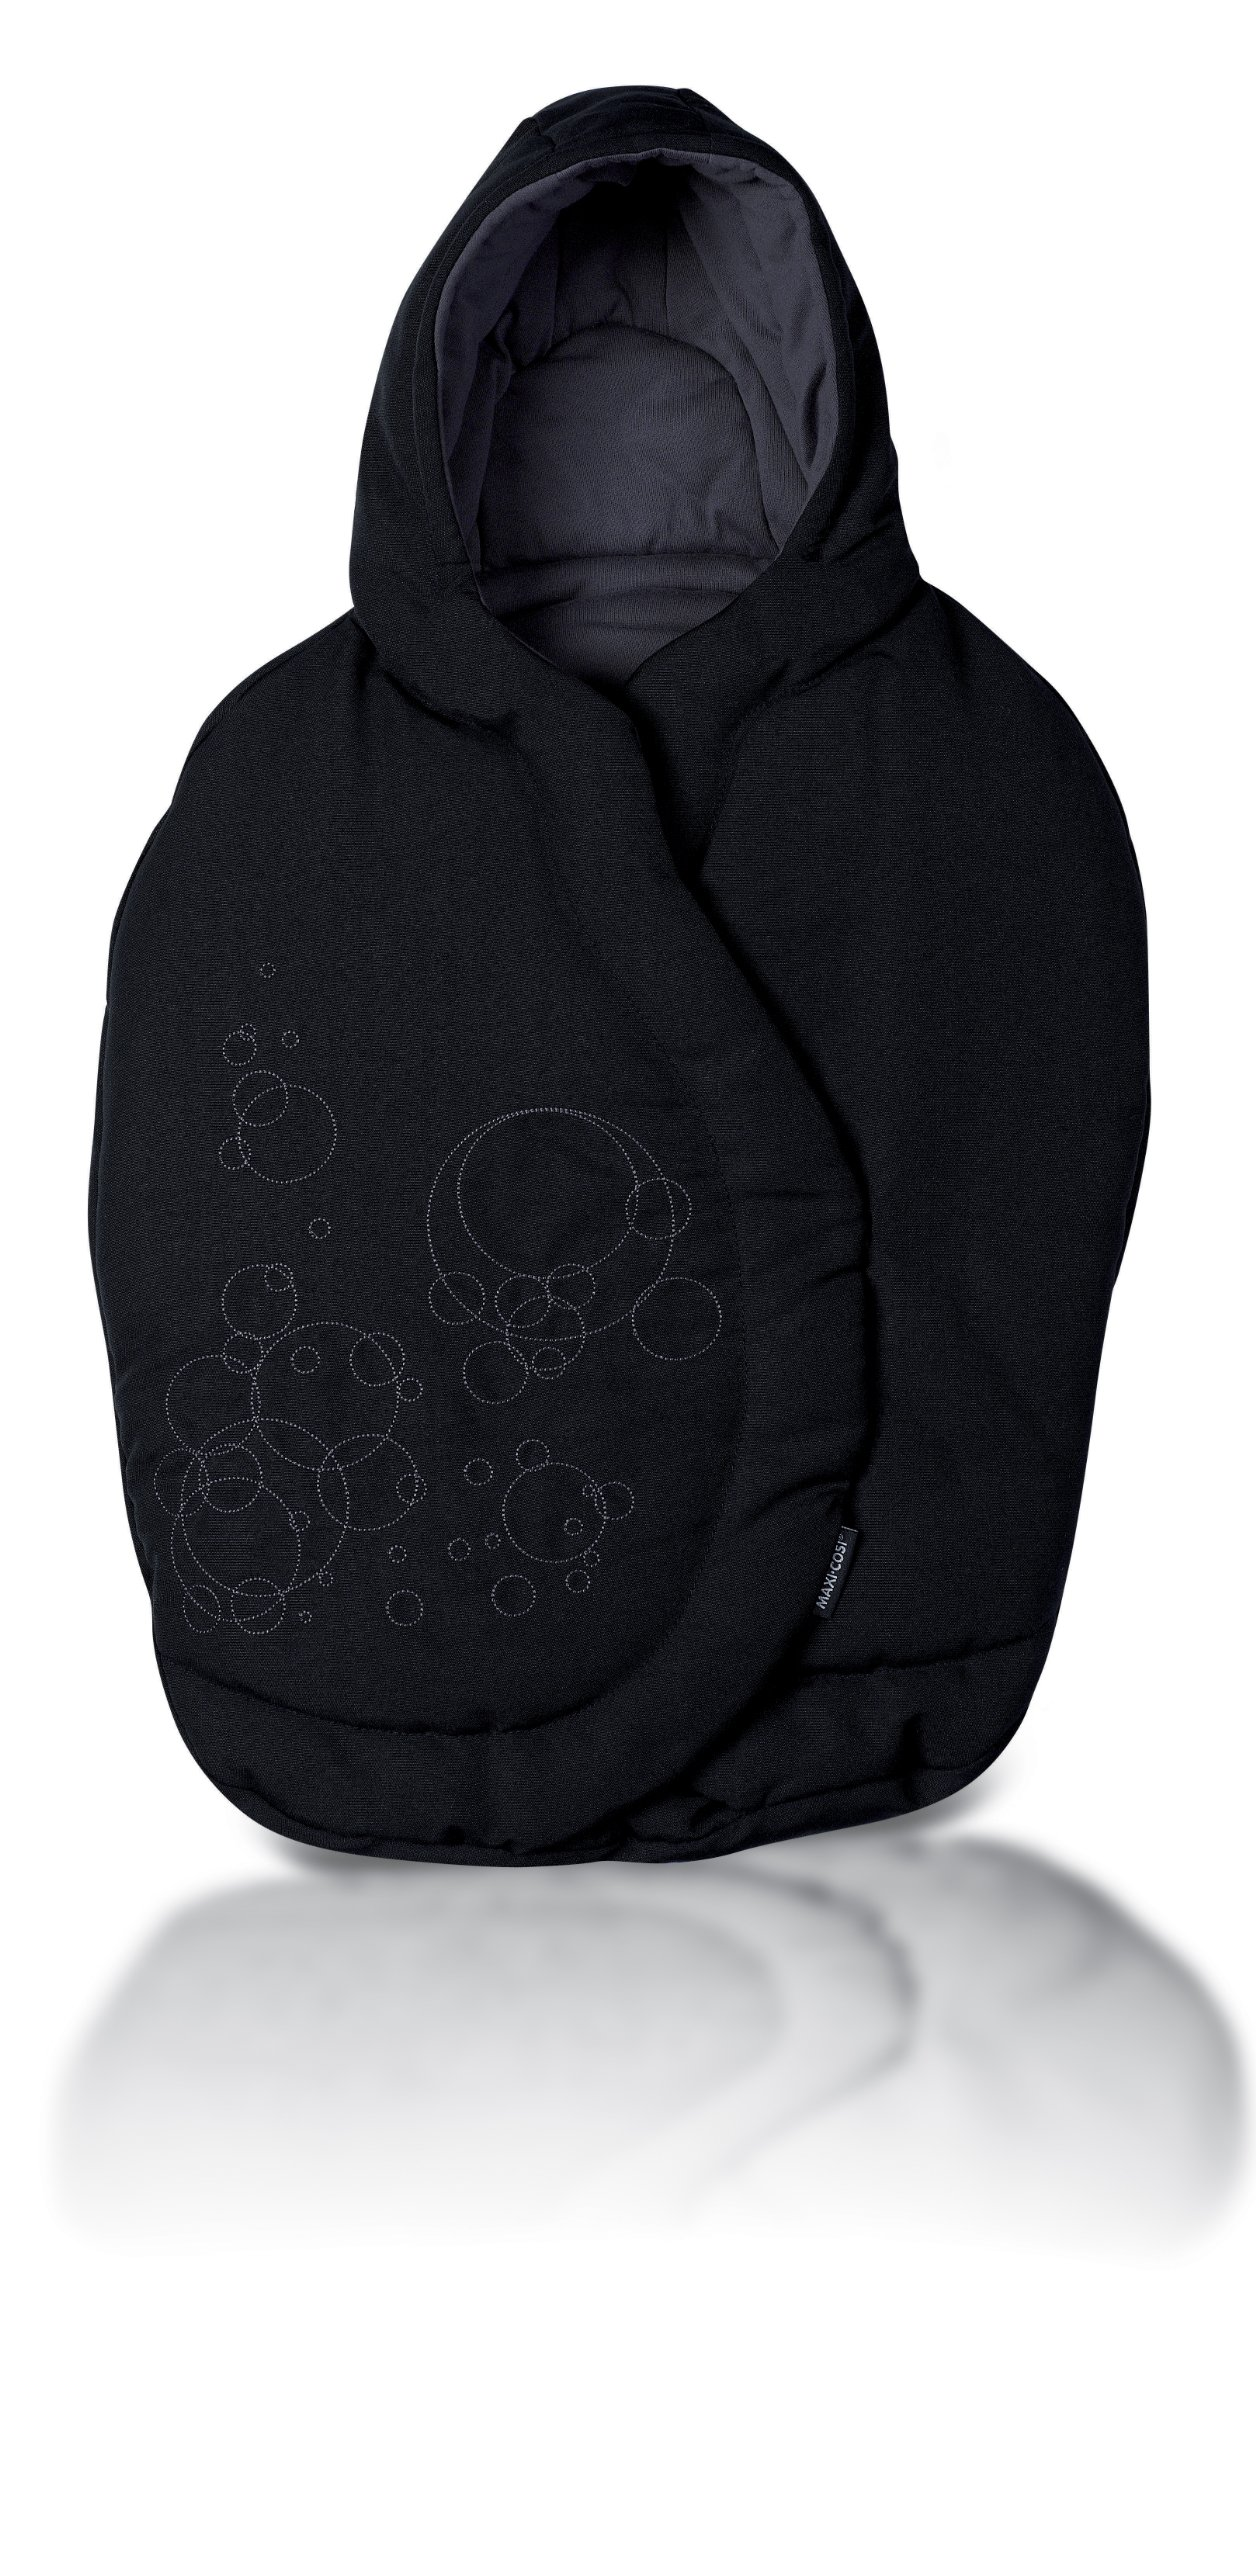 Maxi-Cosi Infant Car Seat Footmuff, Total Black